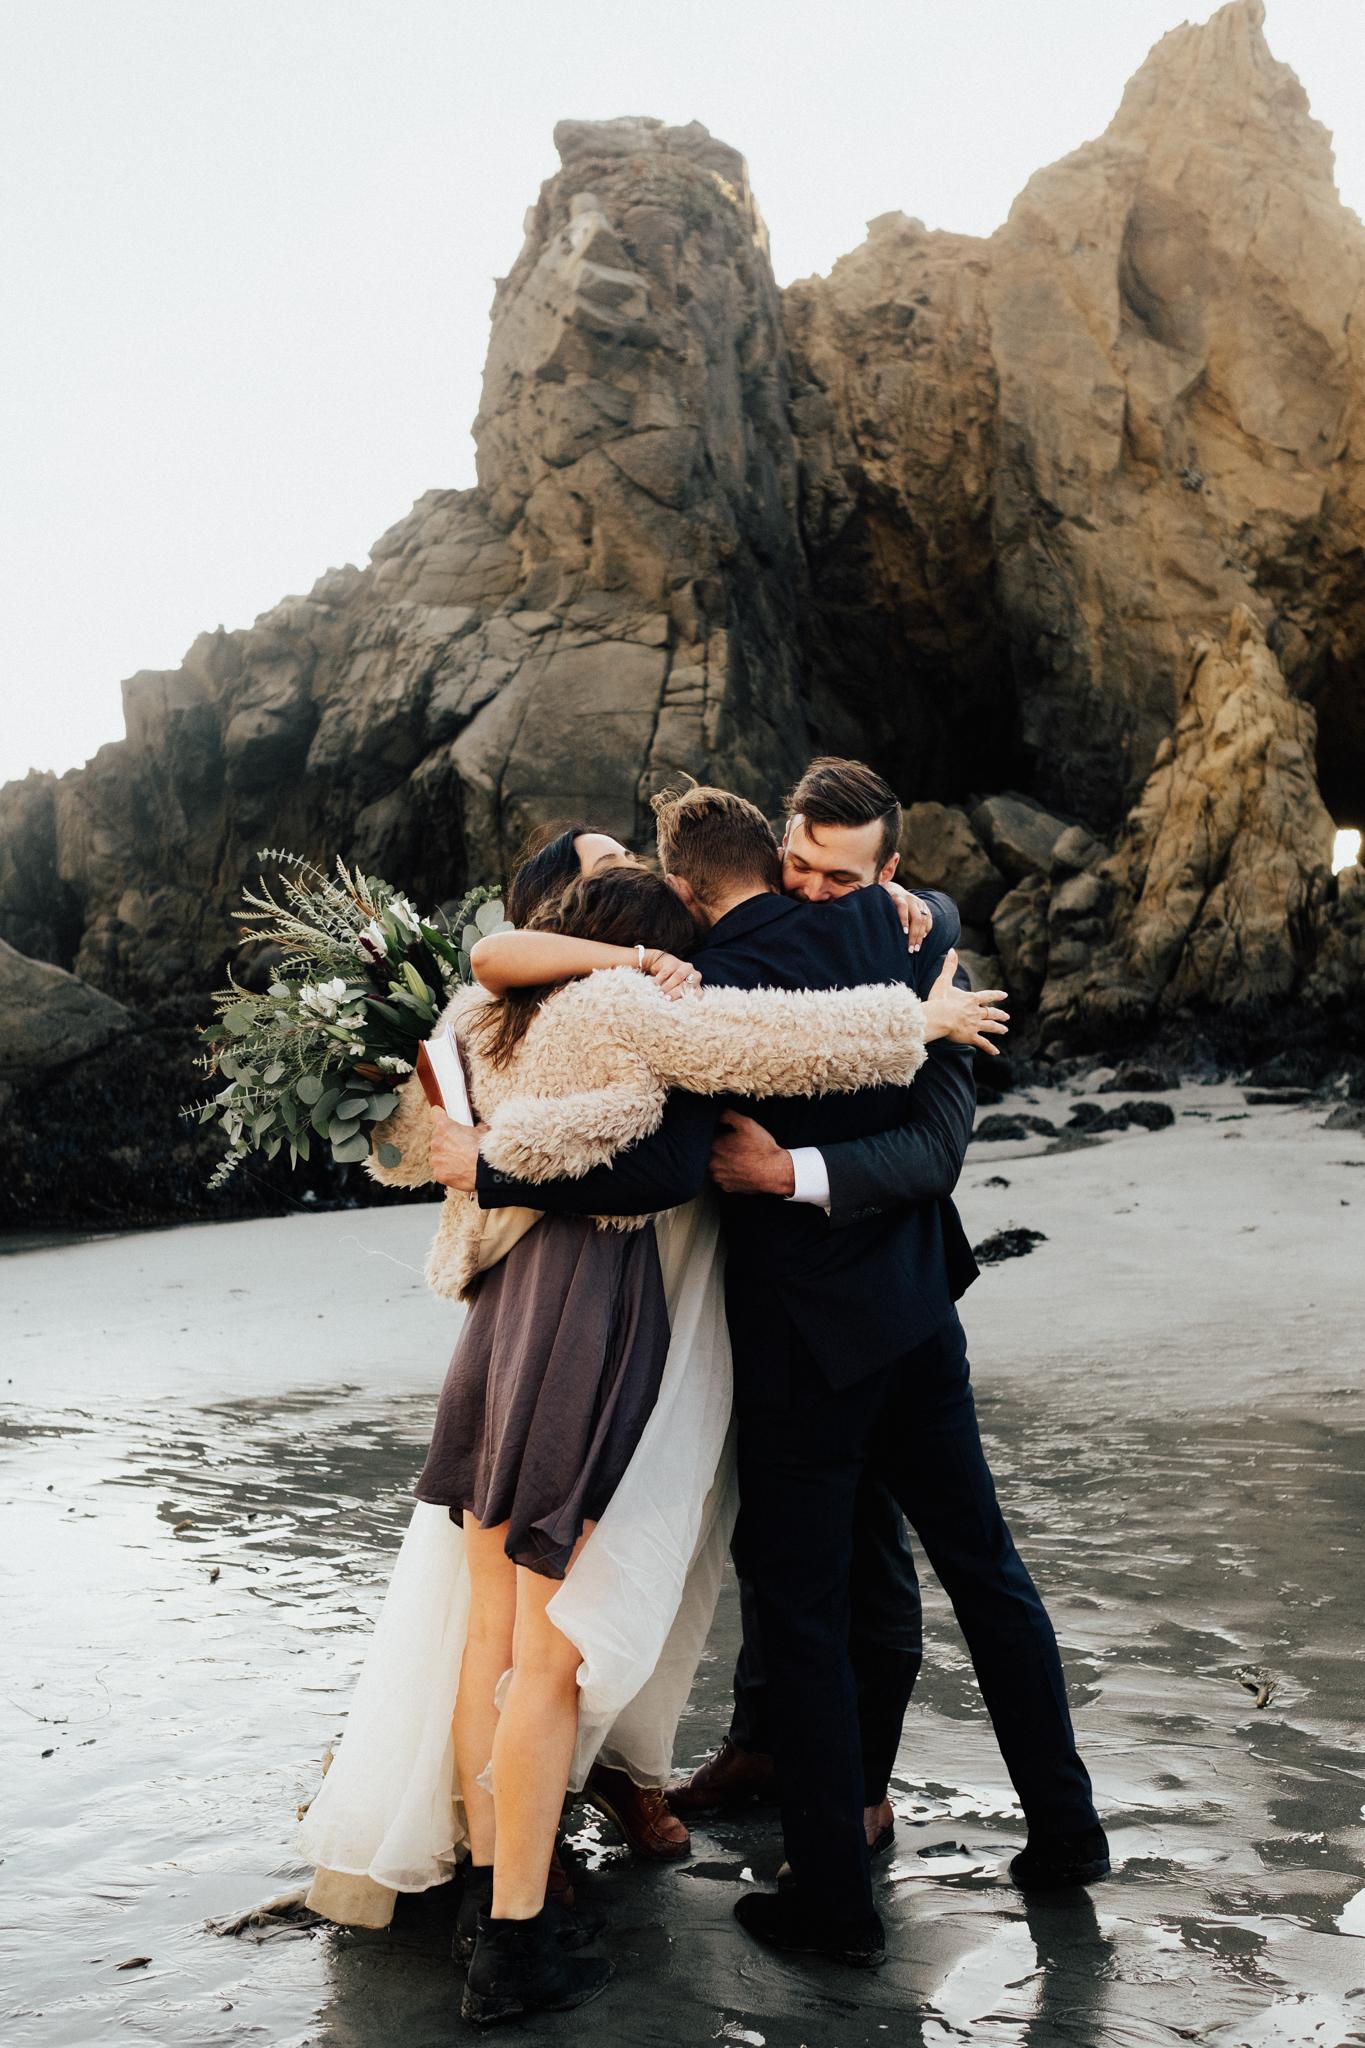 Arizona-Adventure-Elopement-Wedding-Photographer-19.jpg